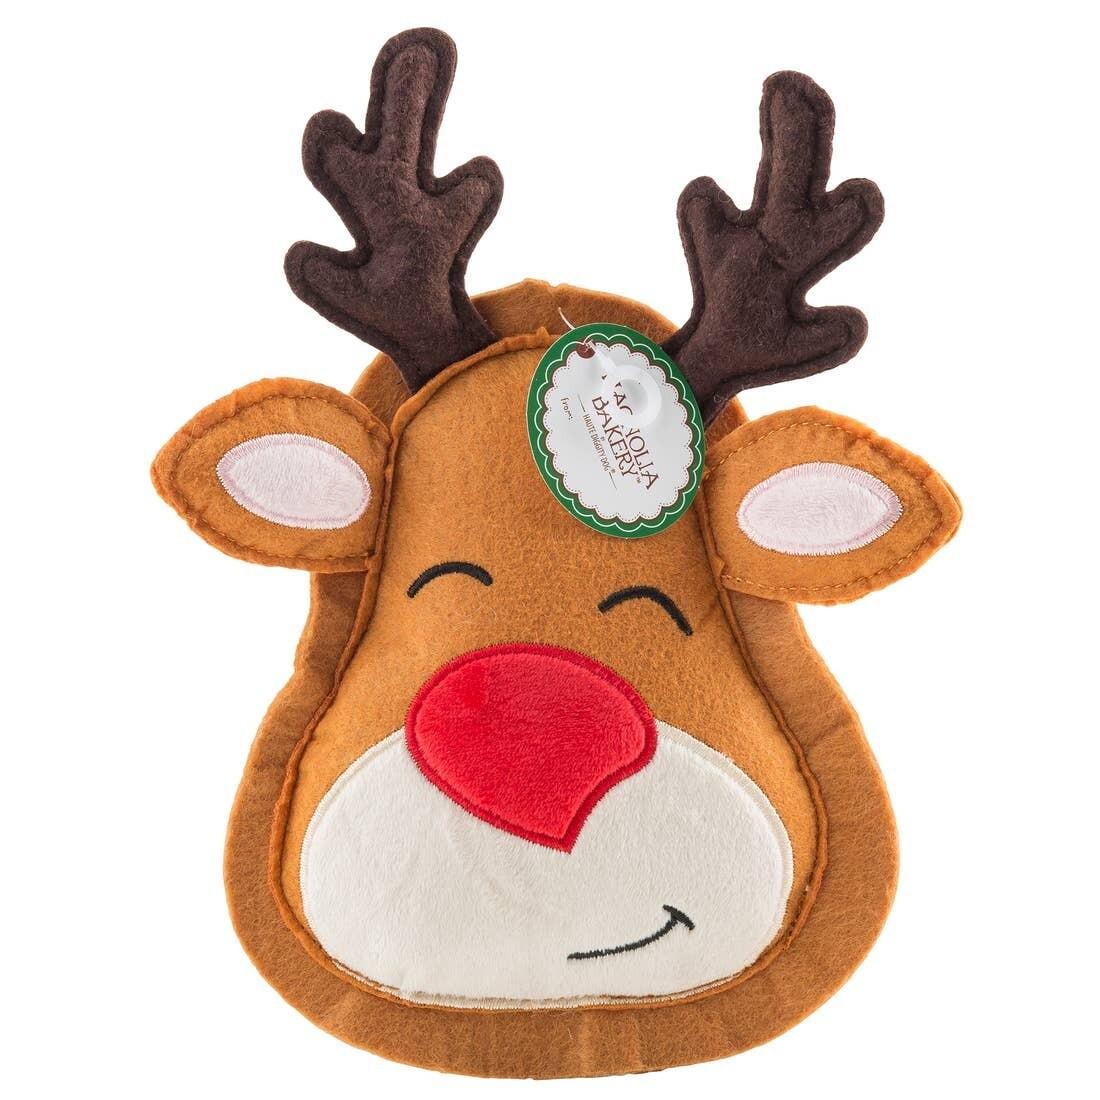 Wagnolia Bakery - Reindeer Toy